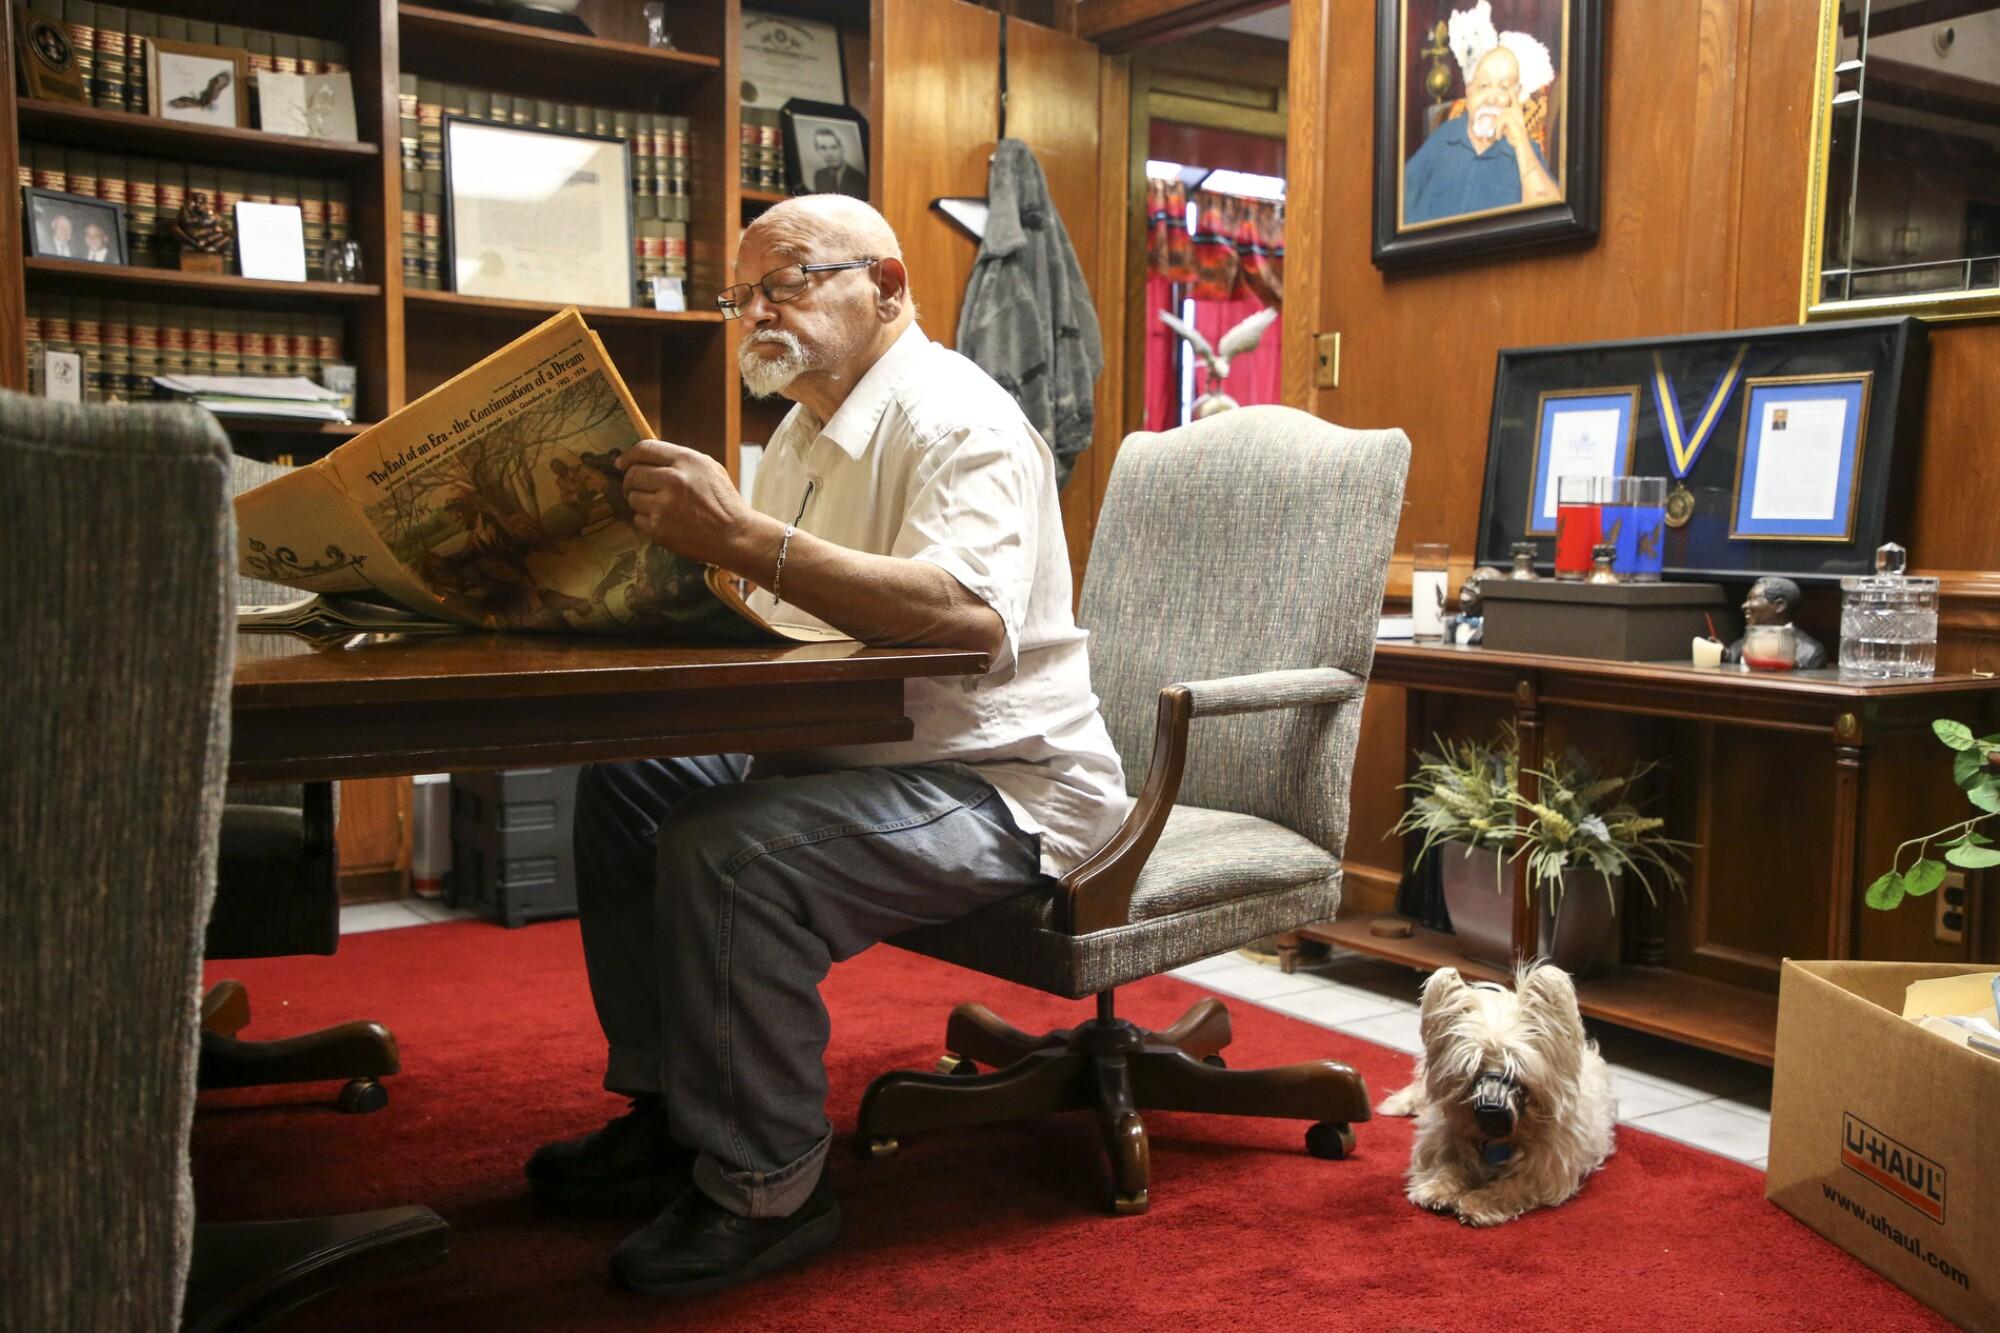 Oklahoma Eagle Publisher Jim Goodwin